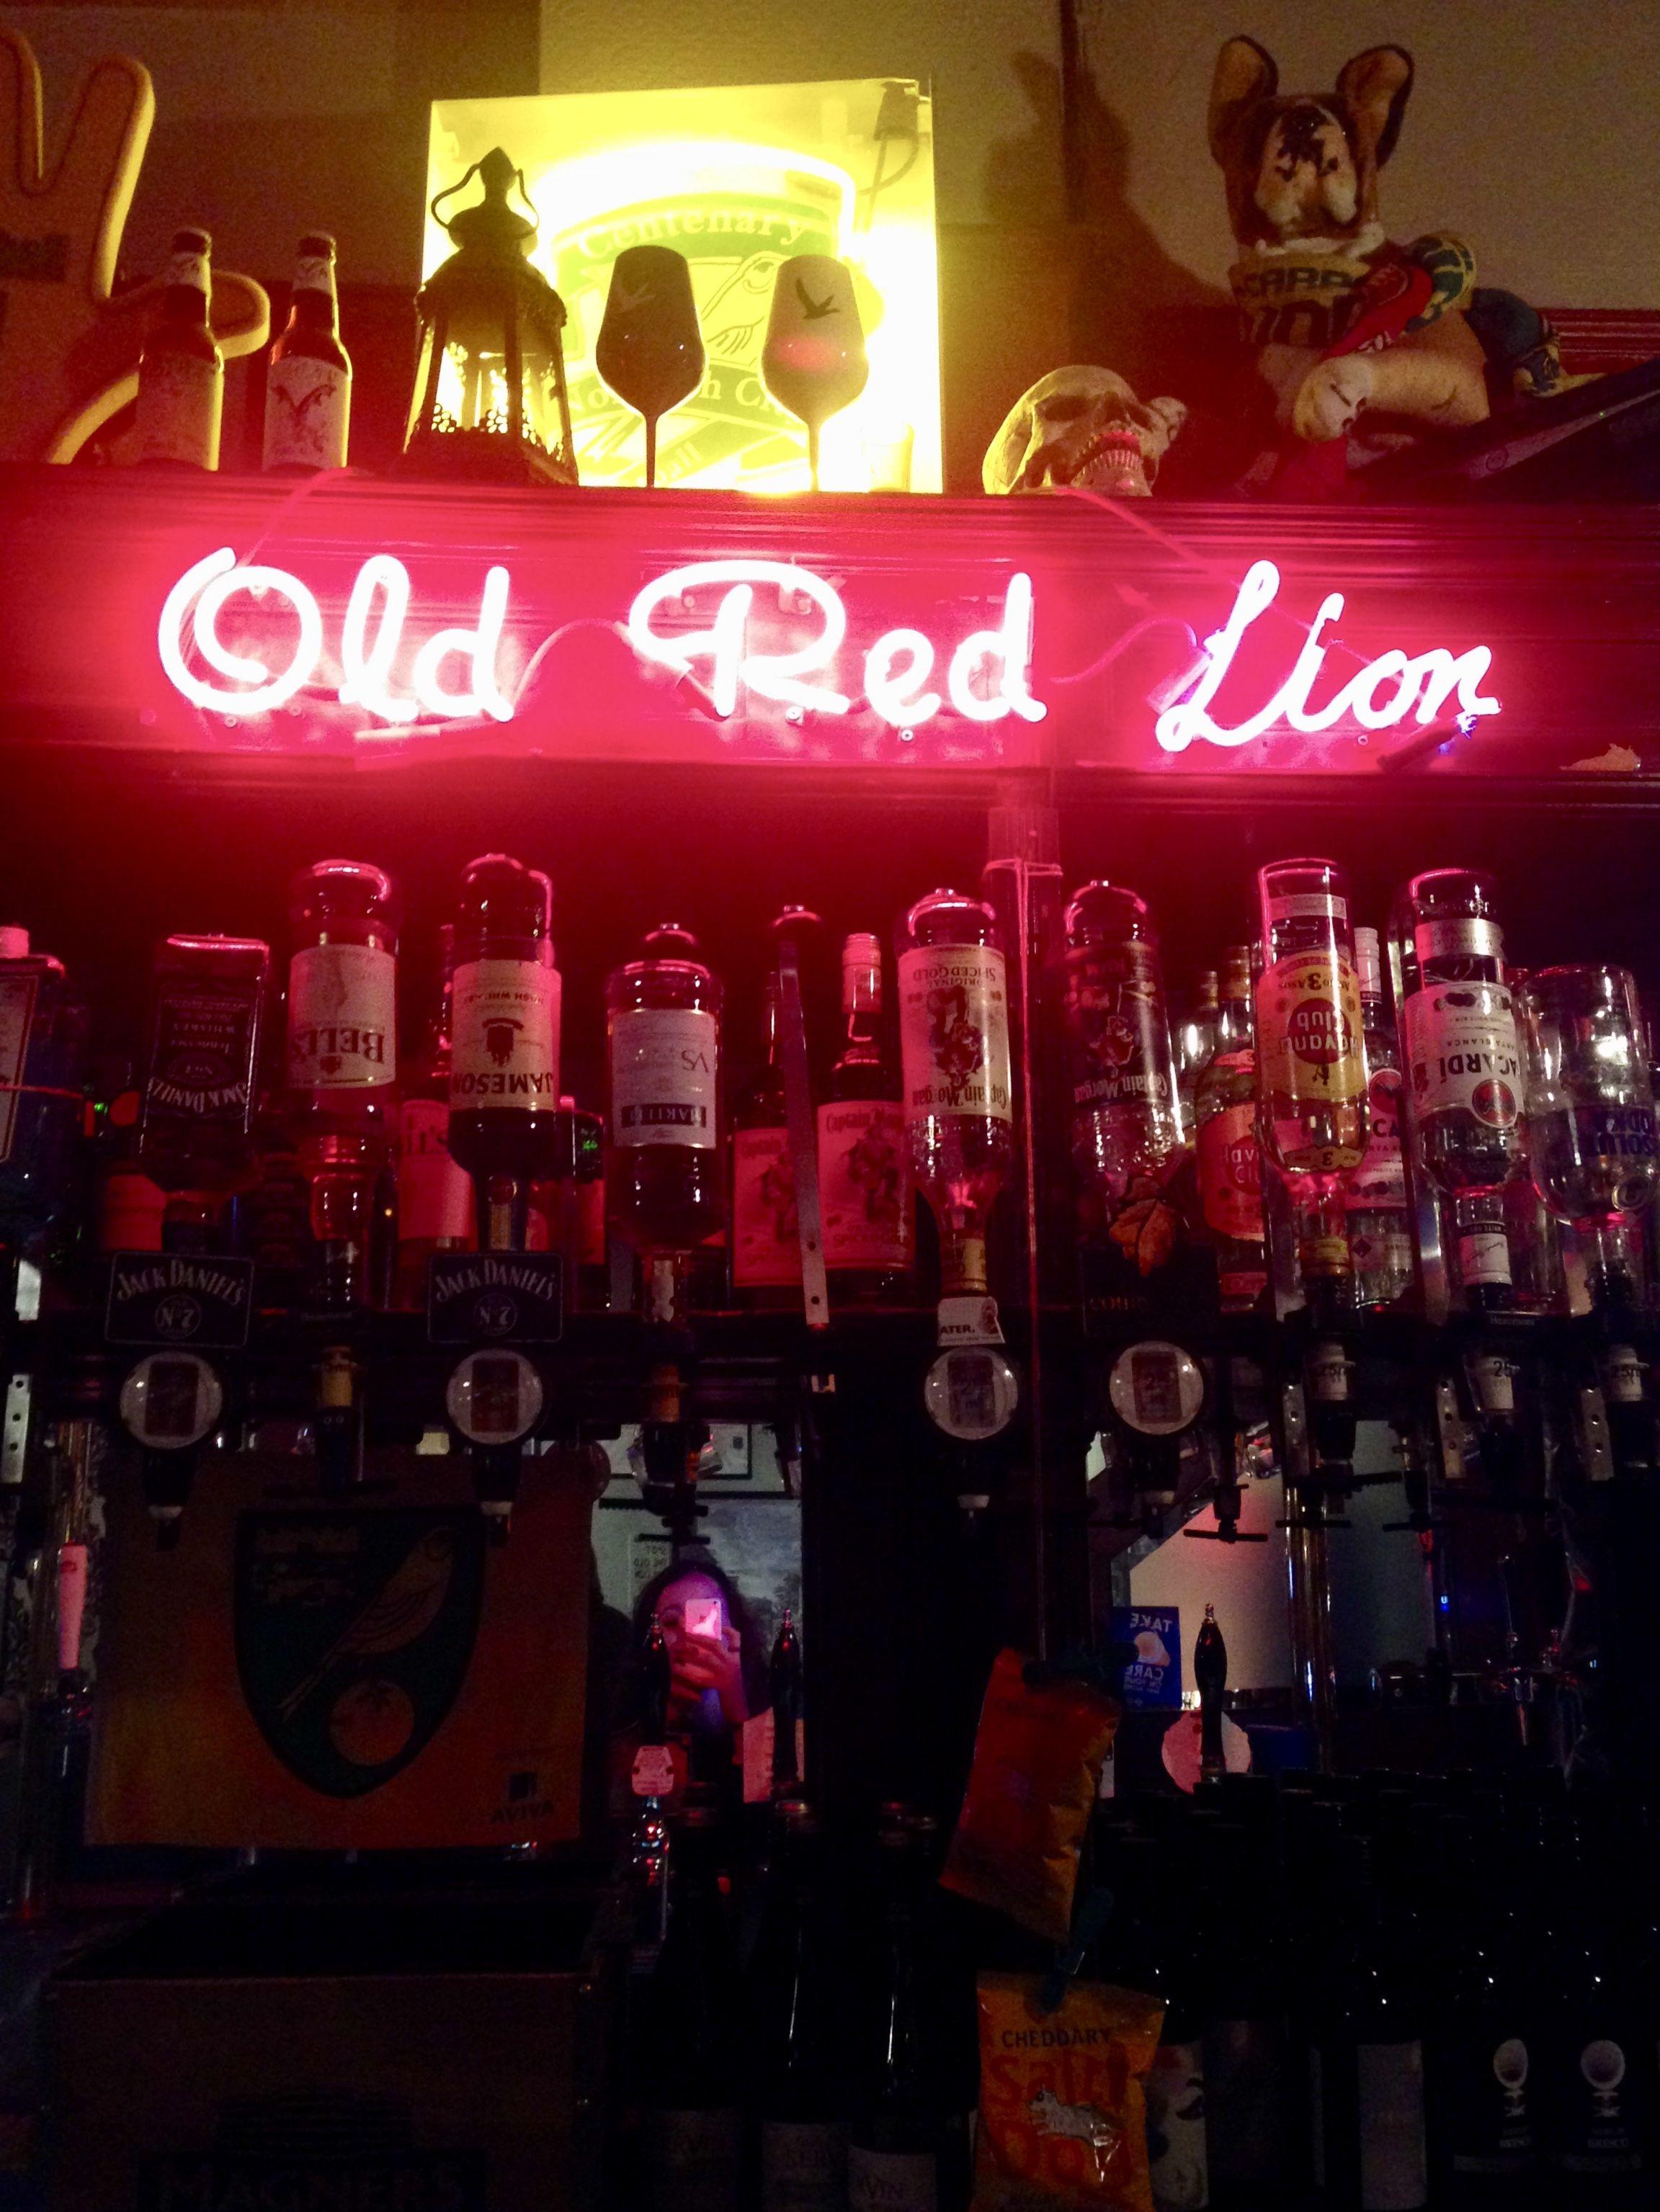 Old Red Lion Pub Angel London Apr 18 Red Lion Pub Pub Red